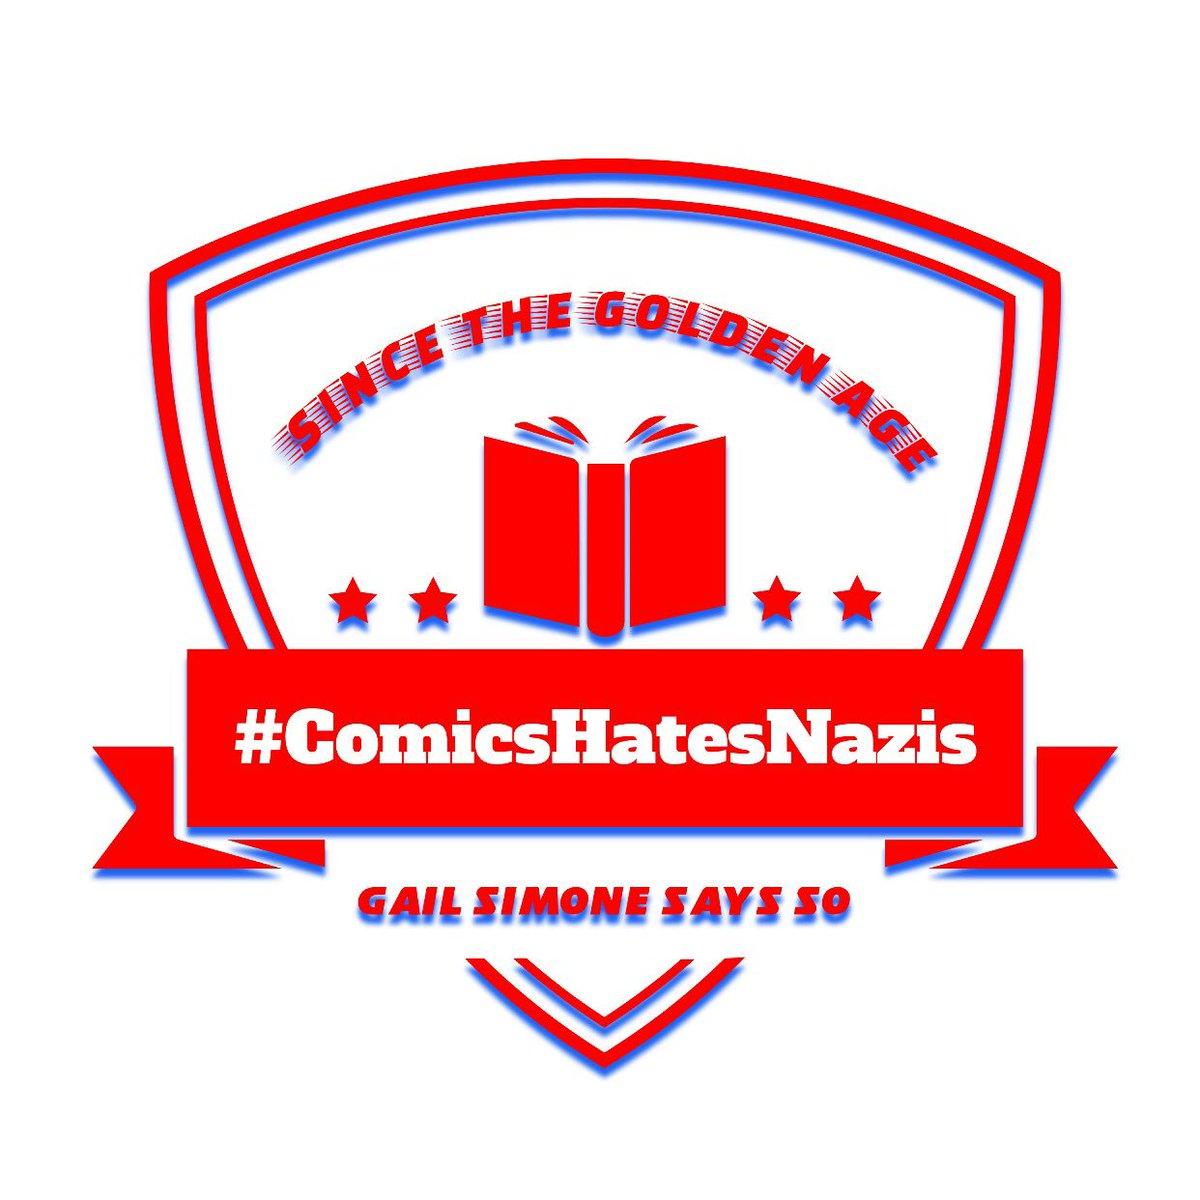 BOOM! @GailSimone #ComicsHatesNazis  #artwork #comicbooks #design #fonts #logo #text #words<br>http://pic.twitter.com/jp1jX6x8B0